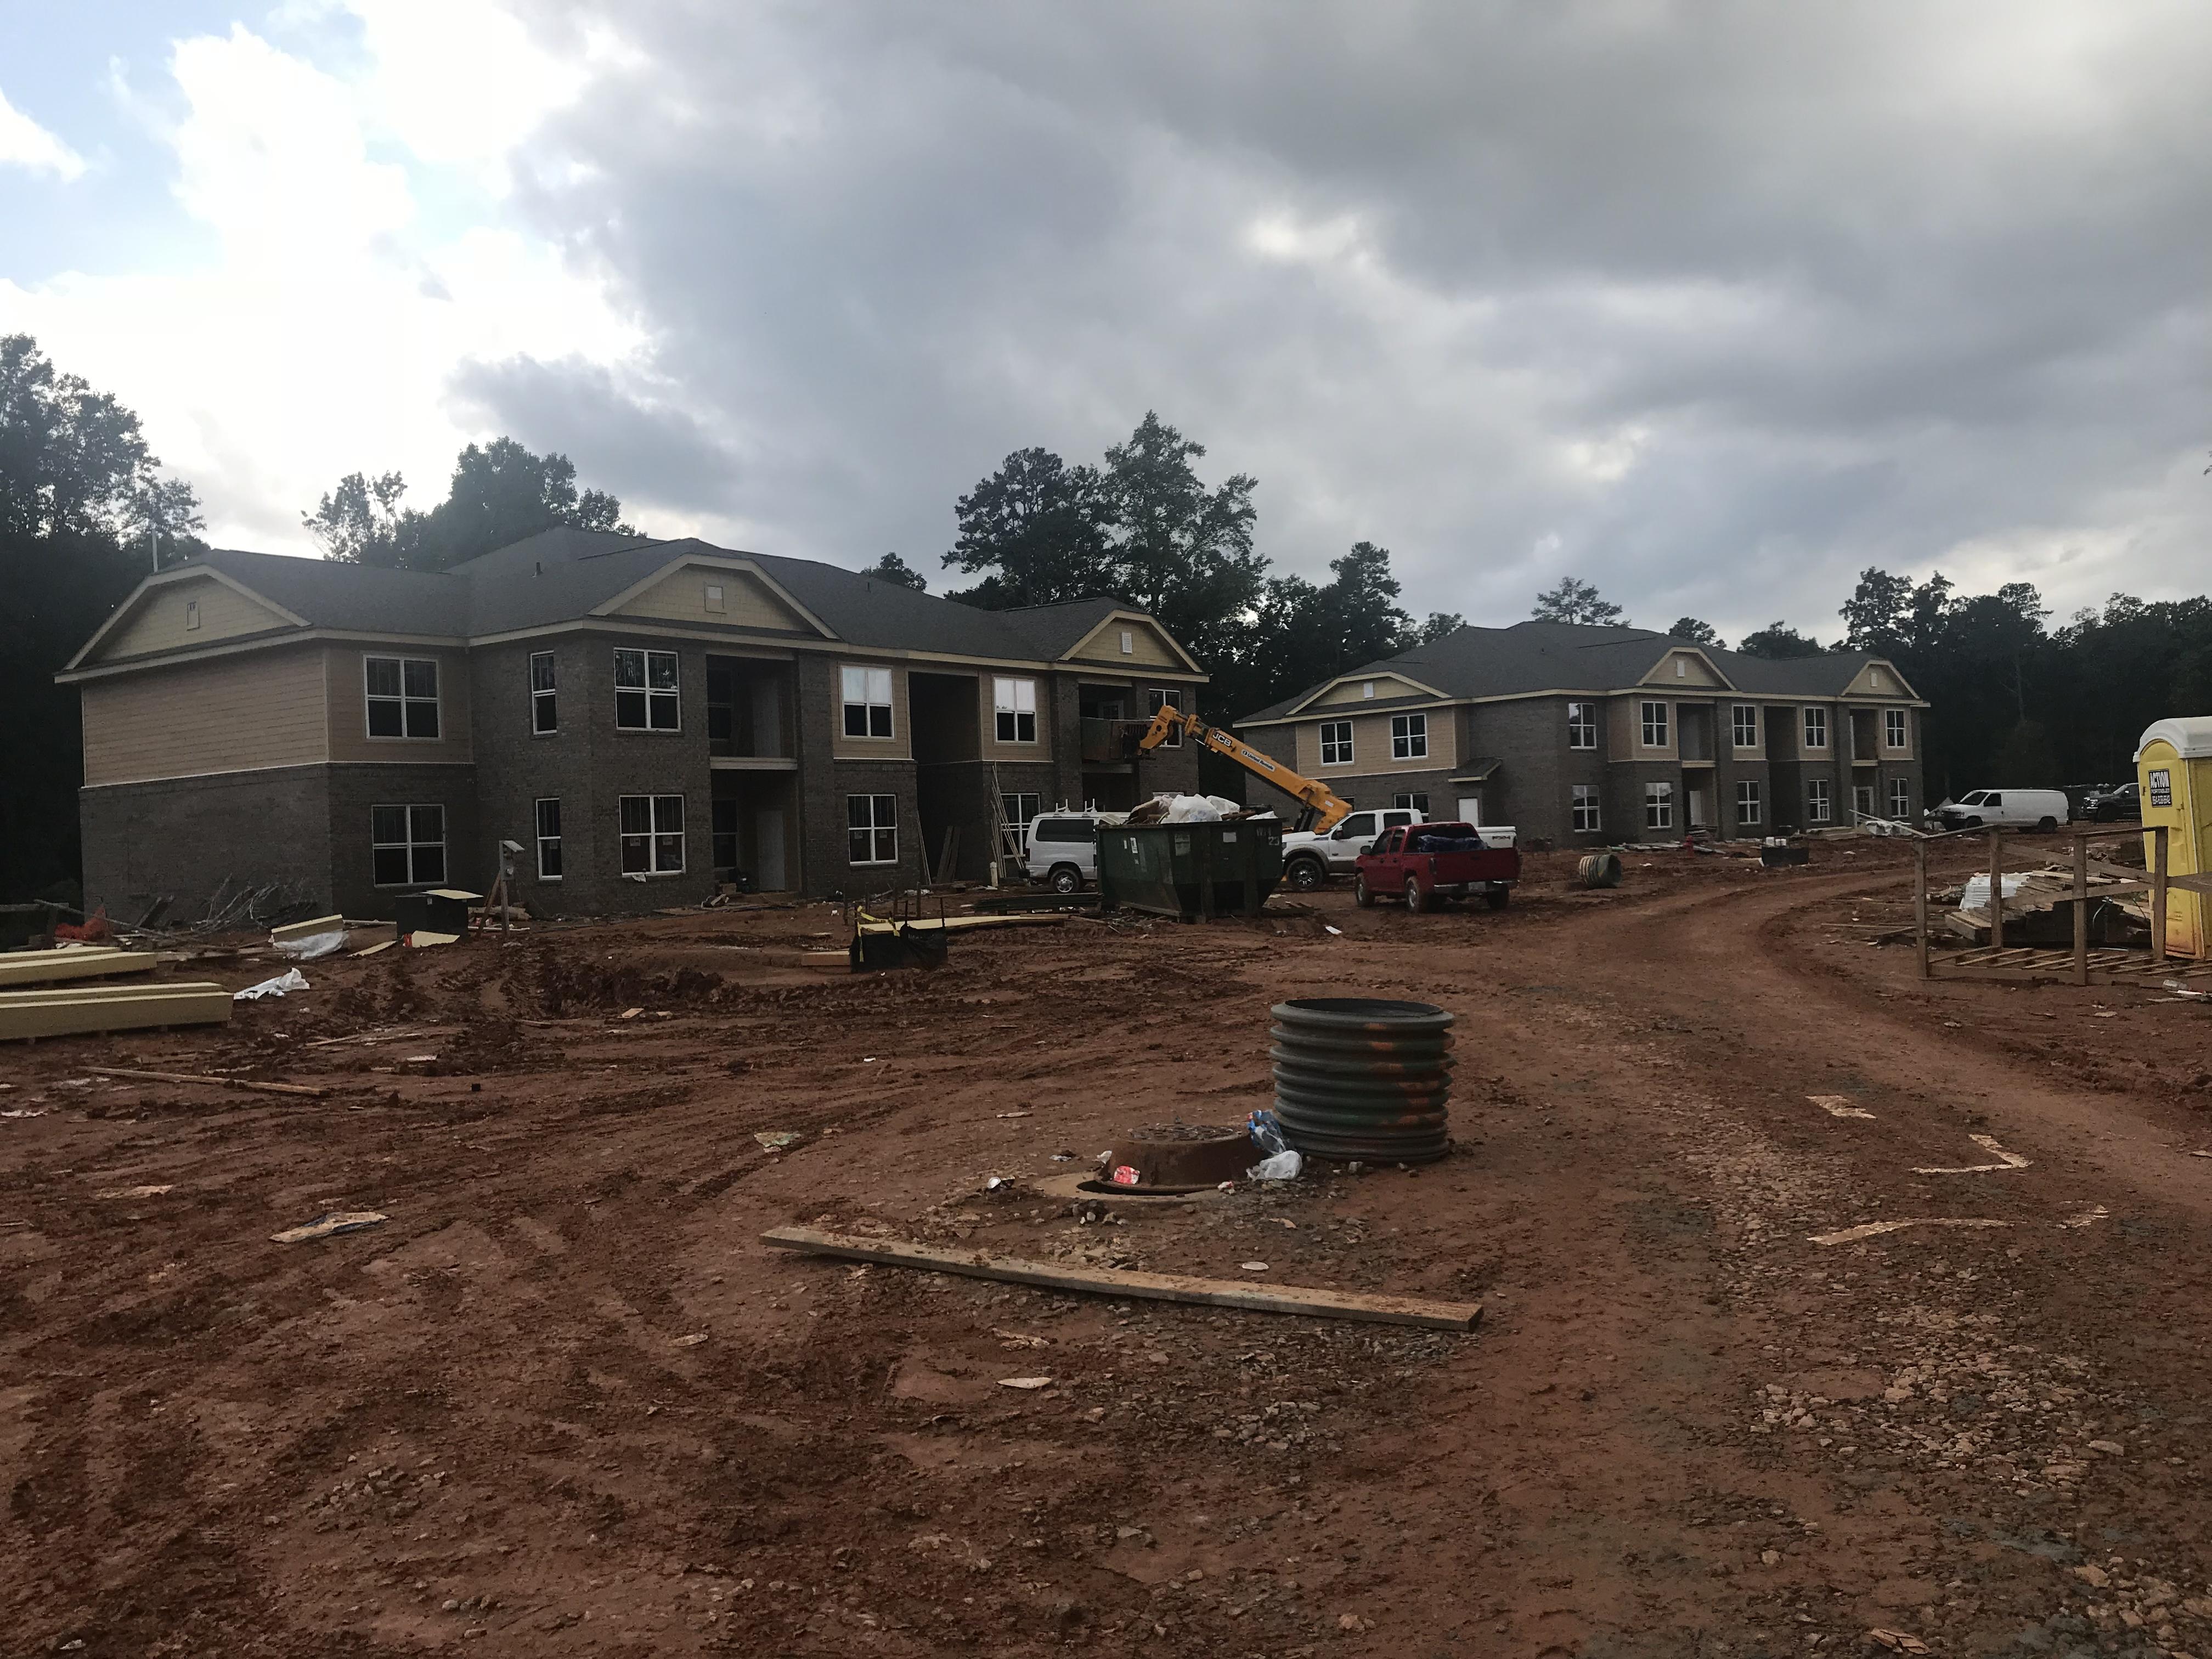 NC Siding 2018-09-25 17.12.57-1